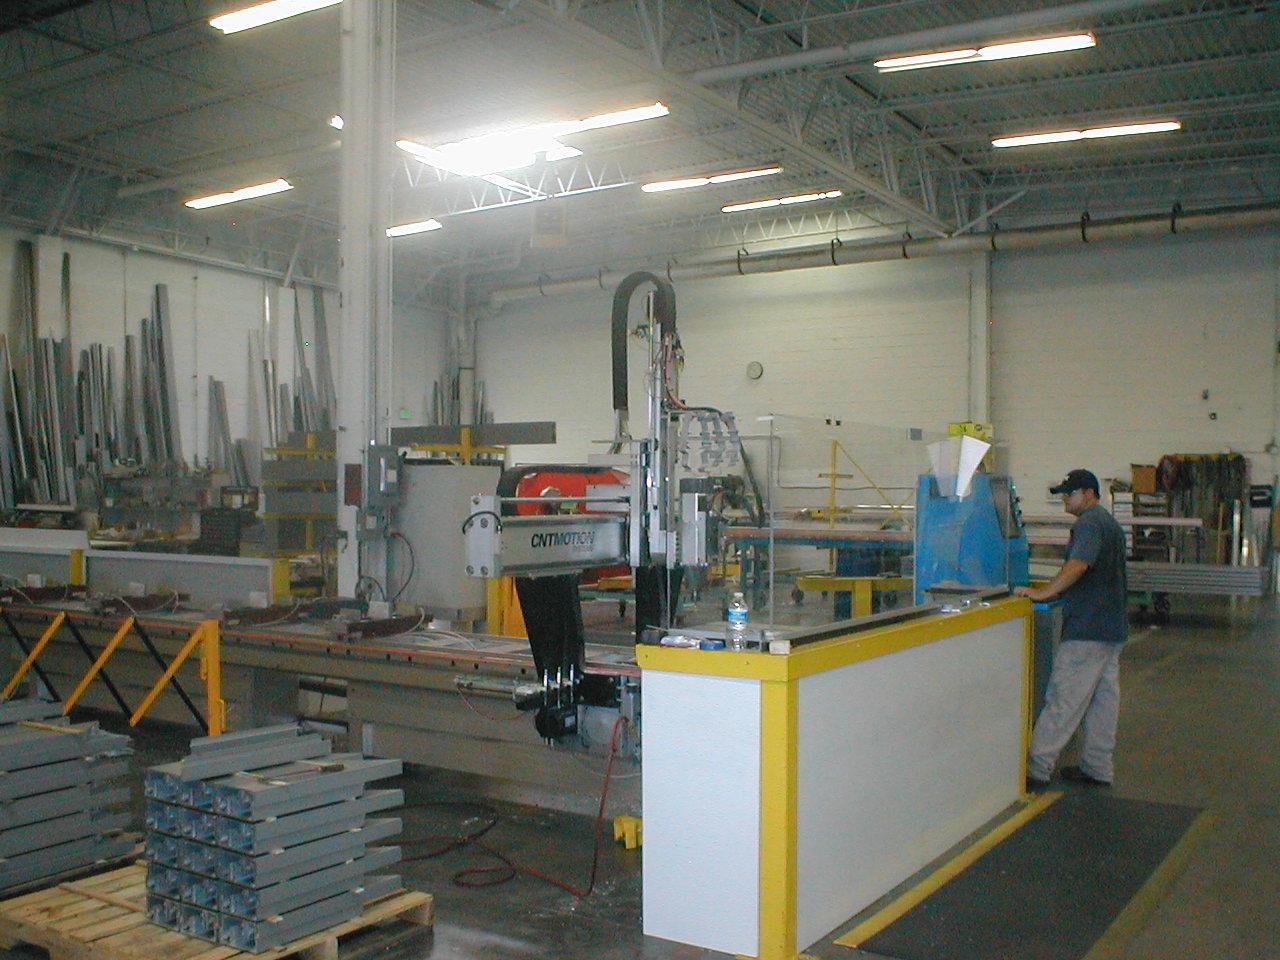 http://2.bp.blogspot.com/-WhgPwFt94NM/Tx2NvBaP3CI/AAAAAAAAEDc/MVXZj6C1TkQ/s1600/ModernIndoorCurtain+Wall+Construction.JPG